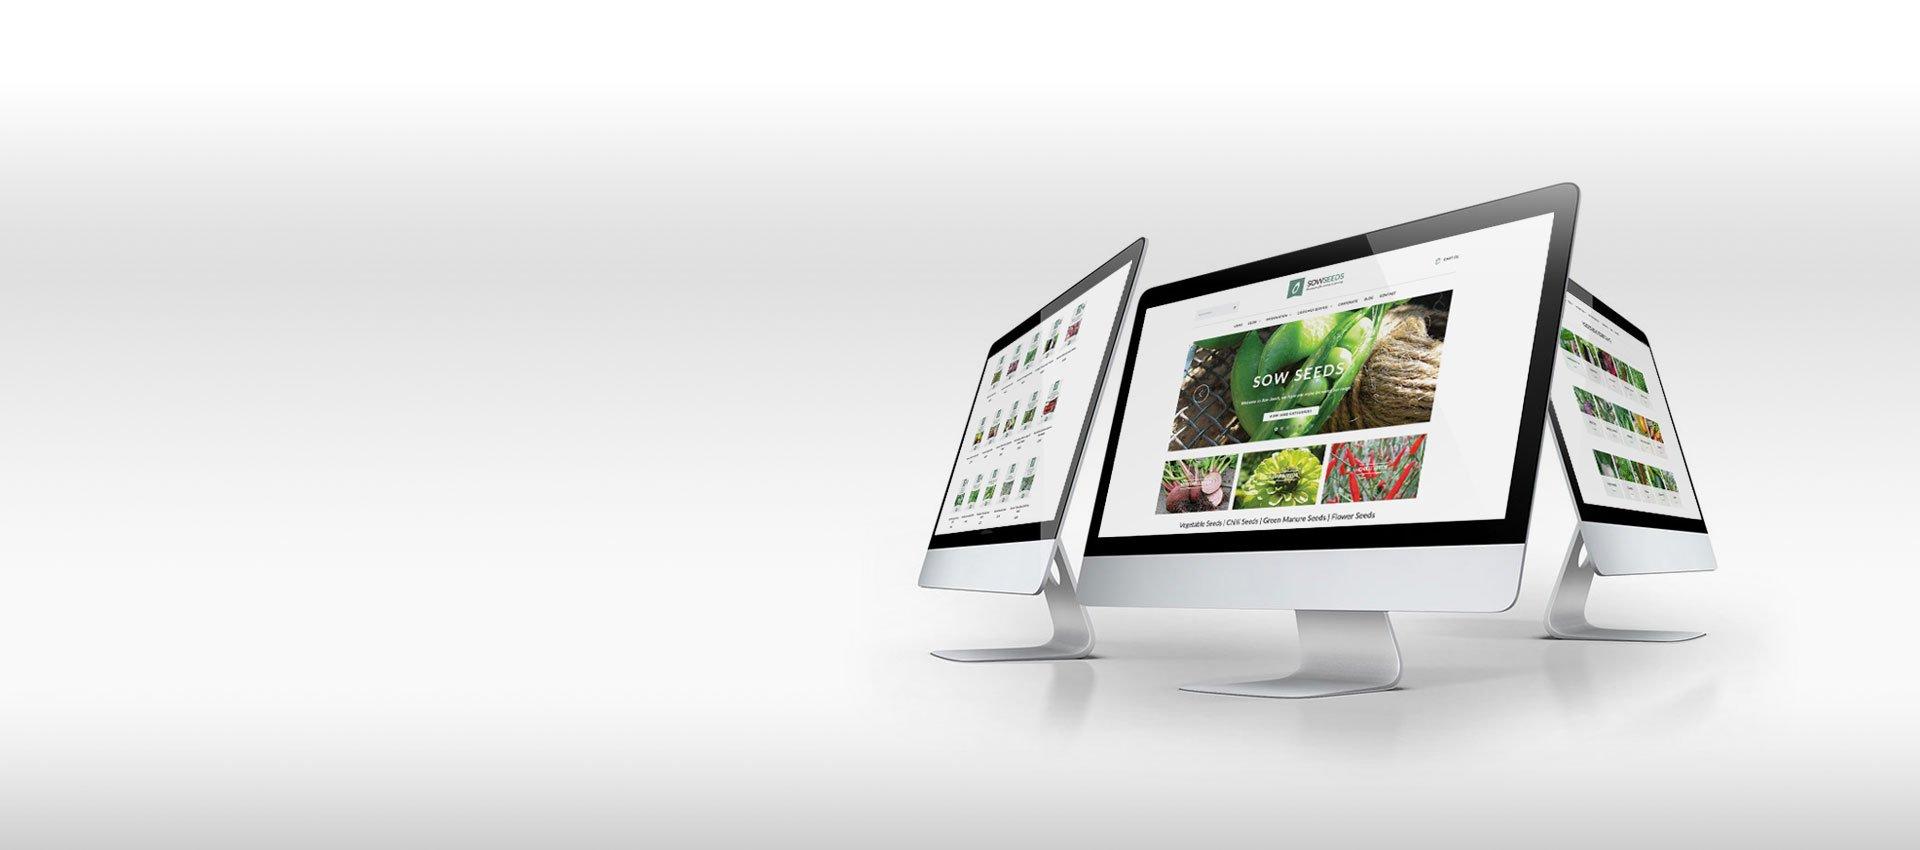 charleston,website,design,SC,media,video,animation